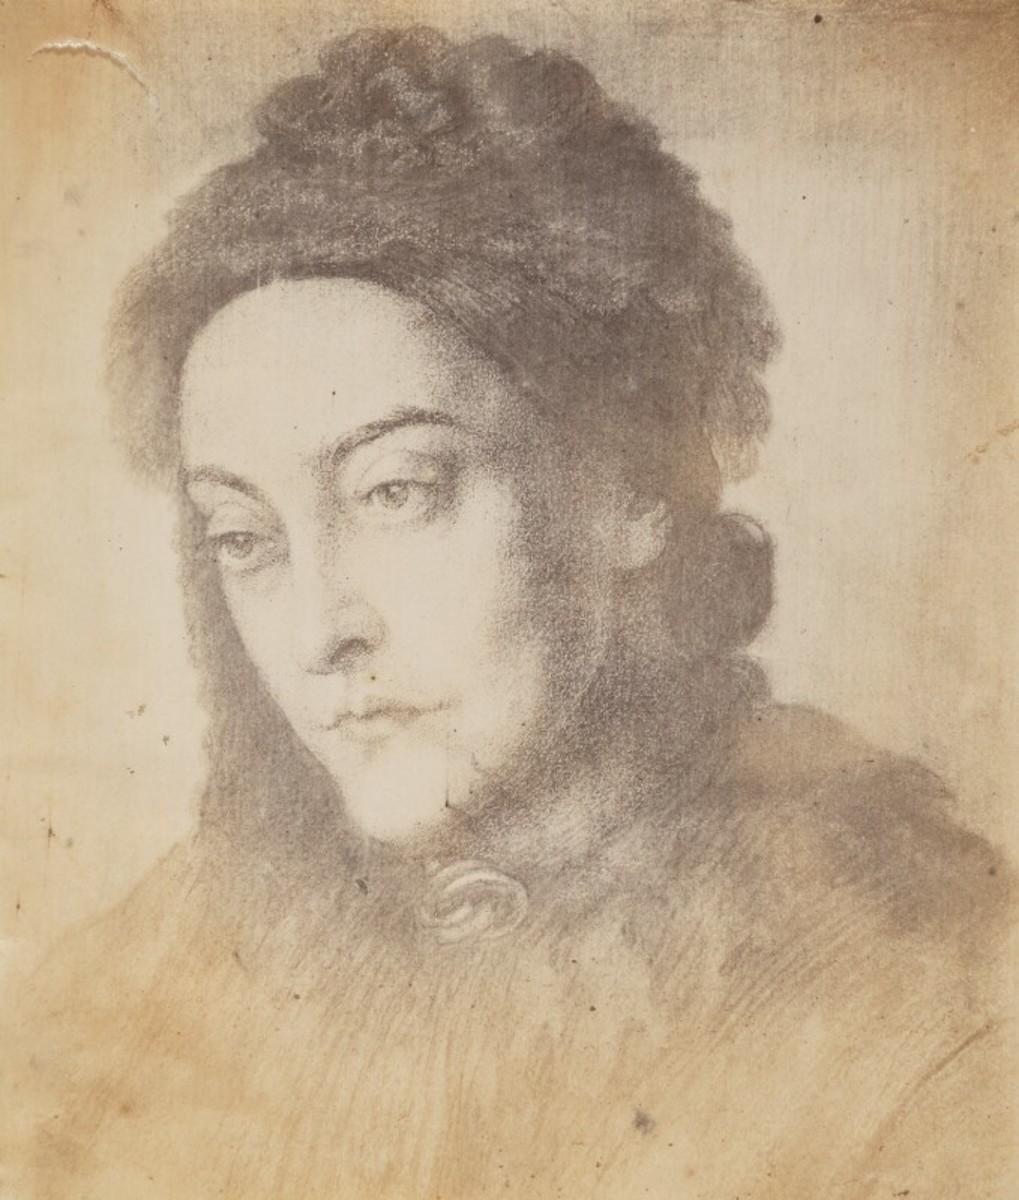 Christina Rossetti's